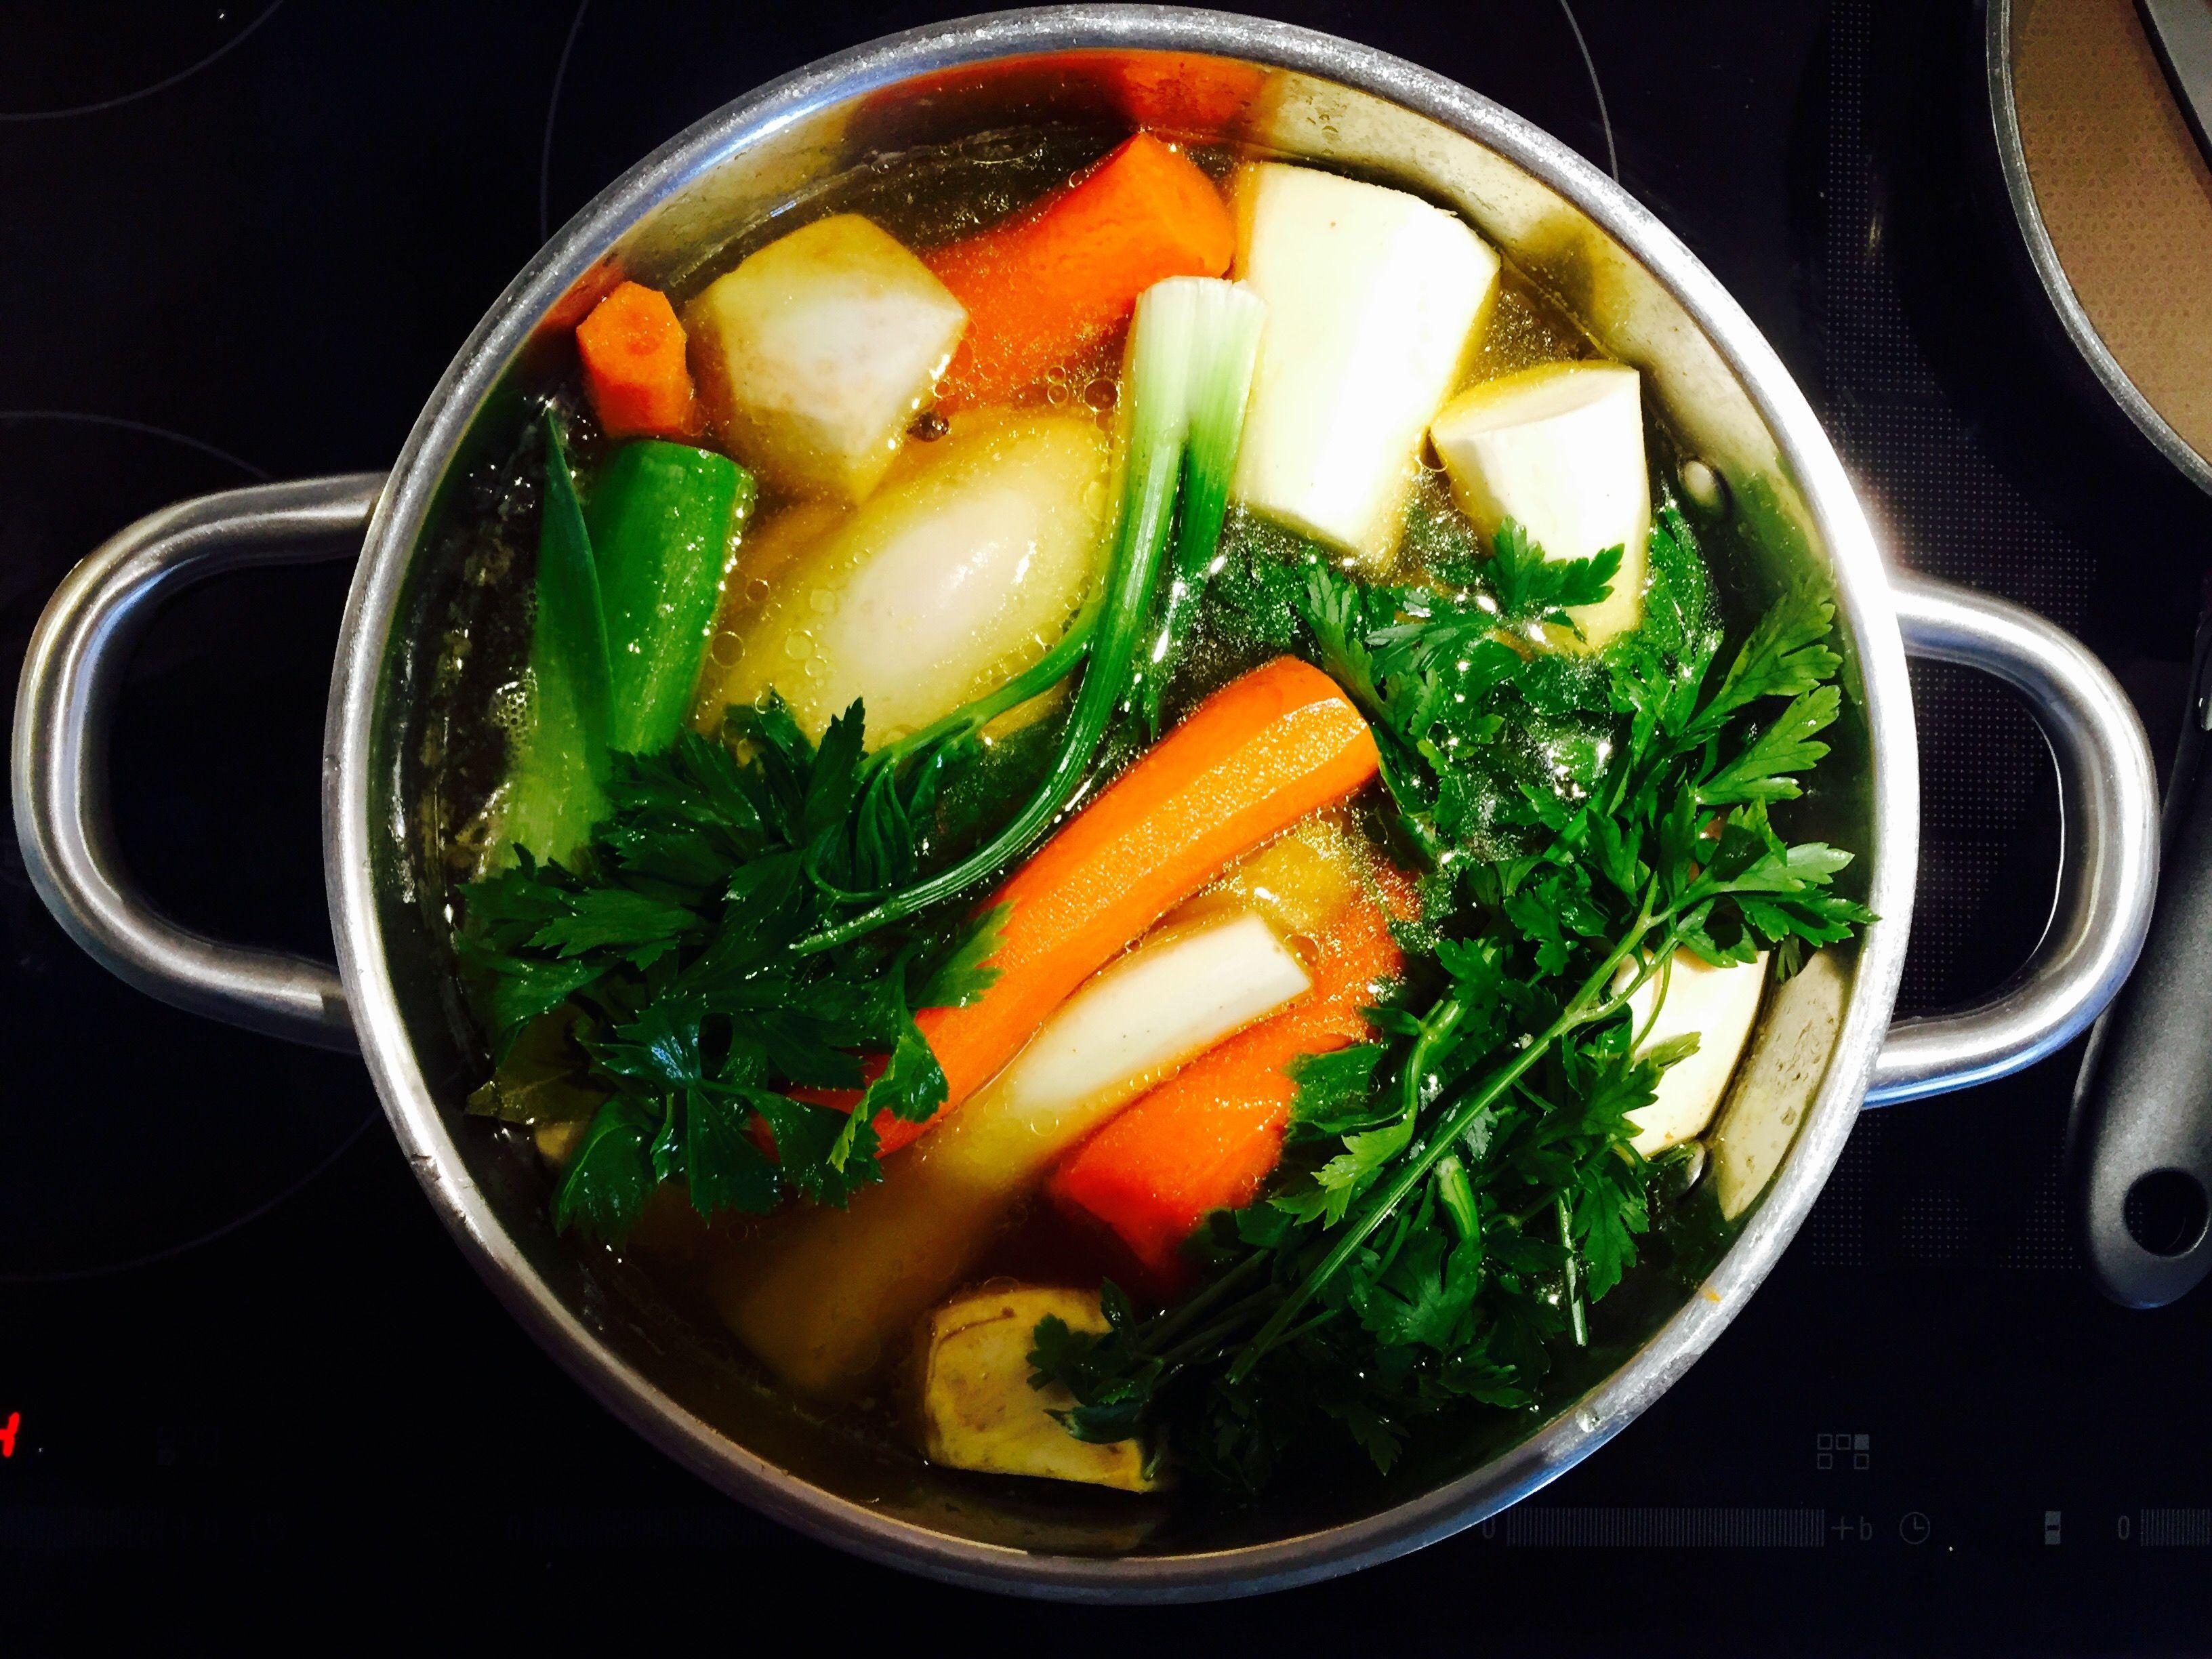 Blanching Vegetables Before Freezing